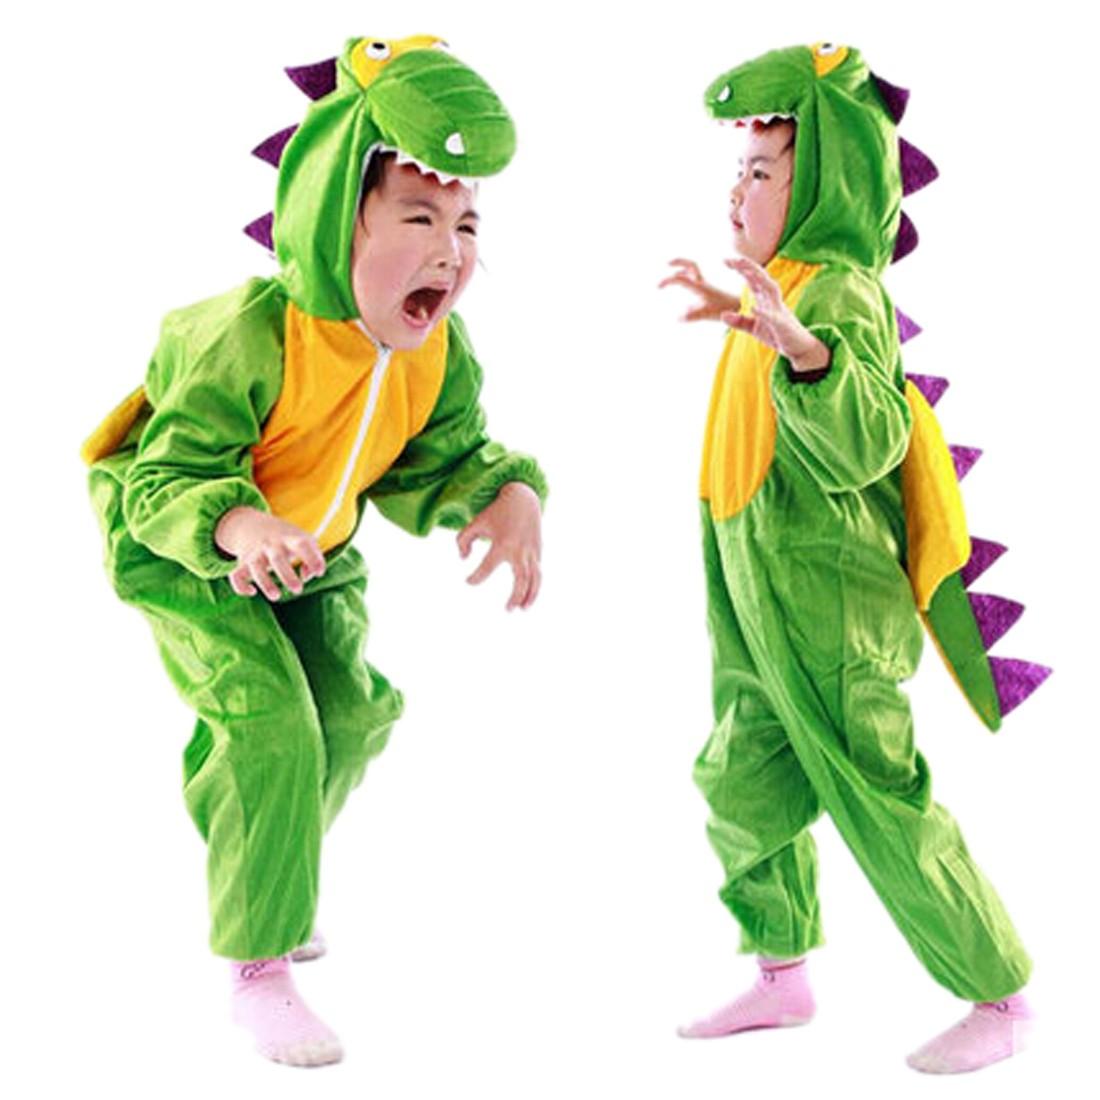 Новогодний костюм динозавра своими руками фото